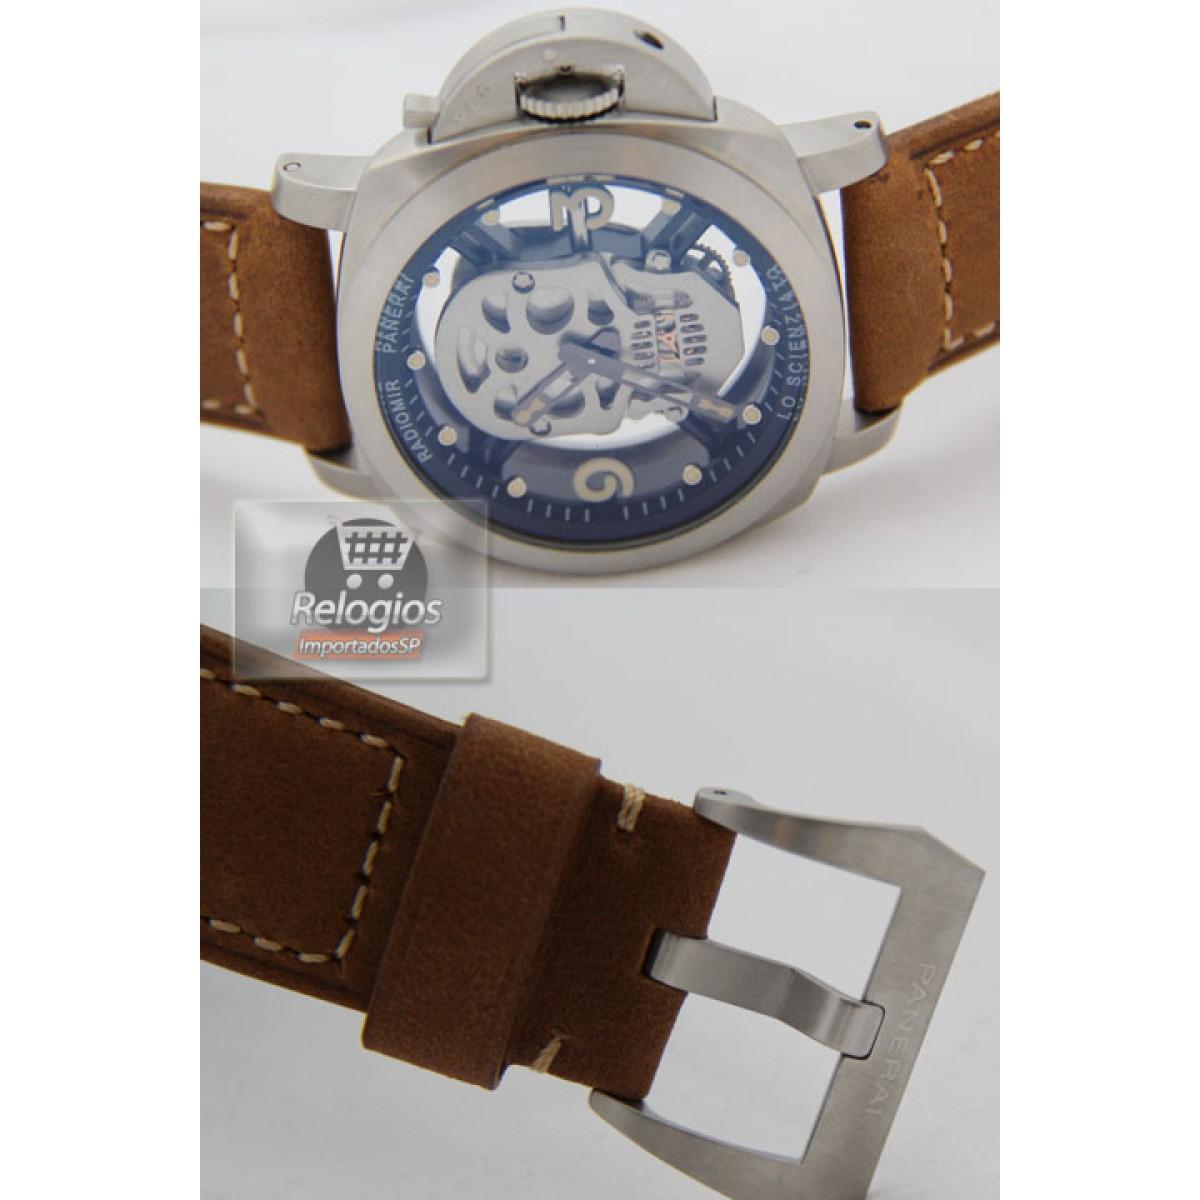 d85ebf38216 Relógio Réplica Panerai Radiomir Caveira Stell